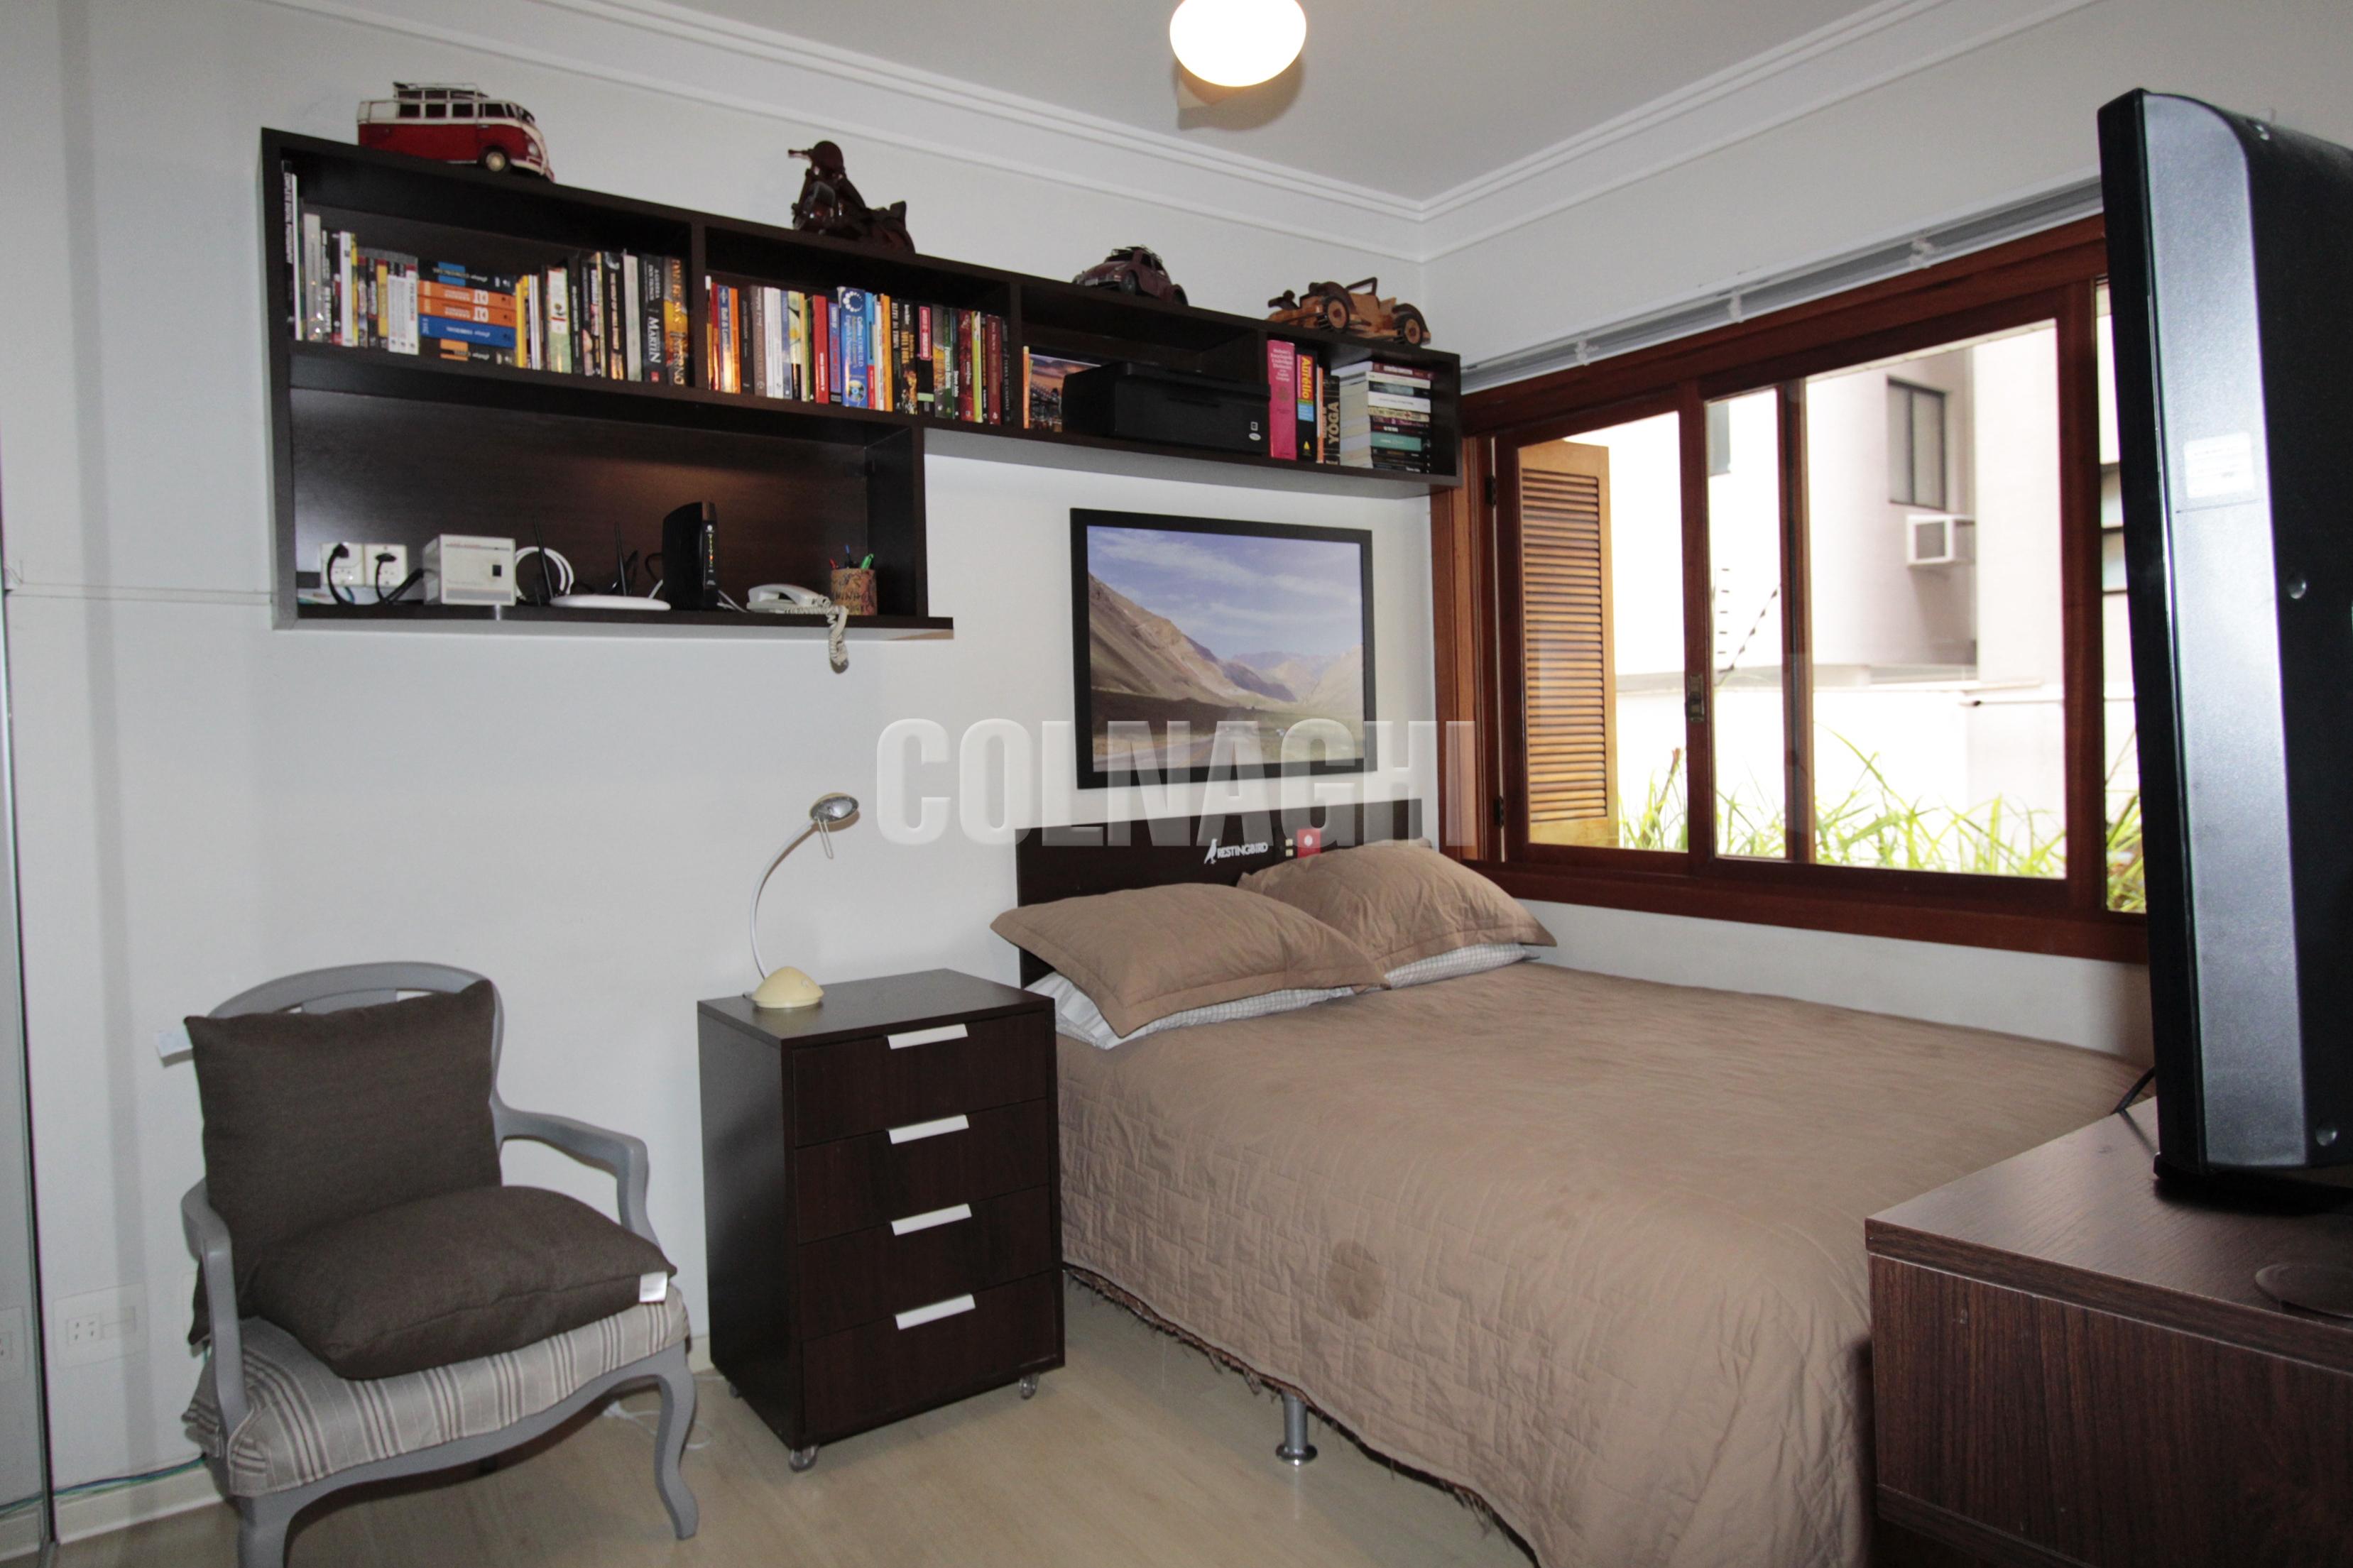 Piaza Nobili - Apto 3 Dorm, Bela Vista, Porto Alegre (CL1328) - Foto 10